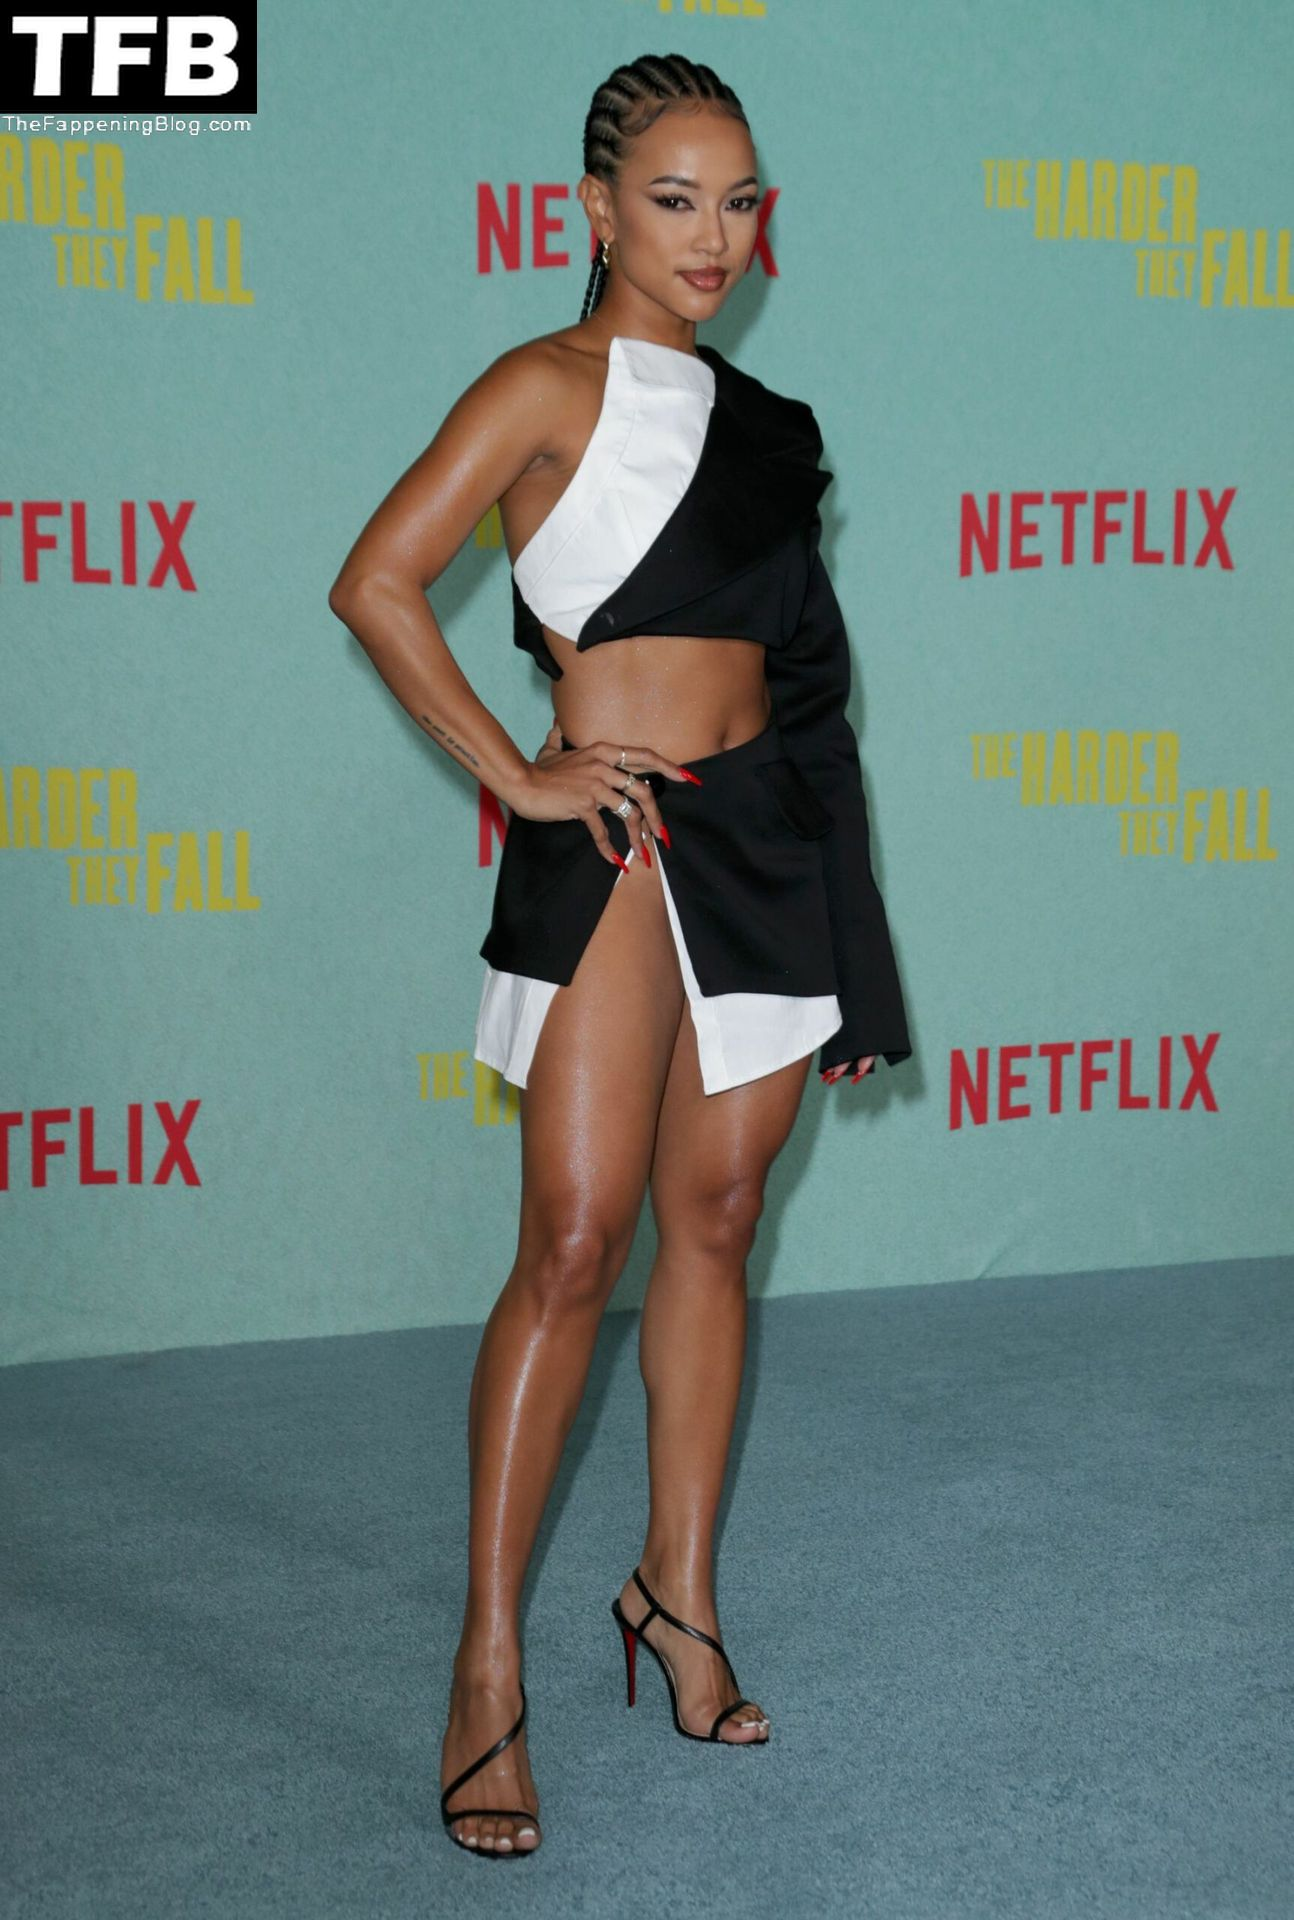 Karrueche-Tran-Sexy-Legs-Upskirt-The-Fappening-Blog-9.jpg